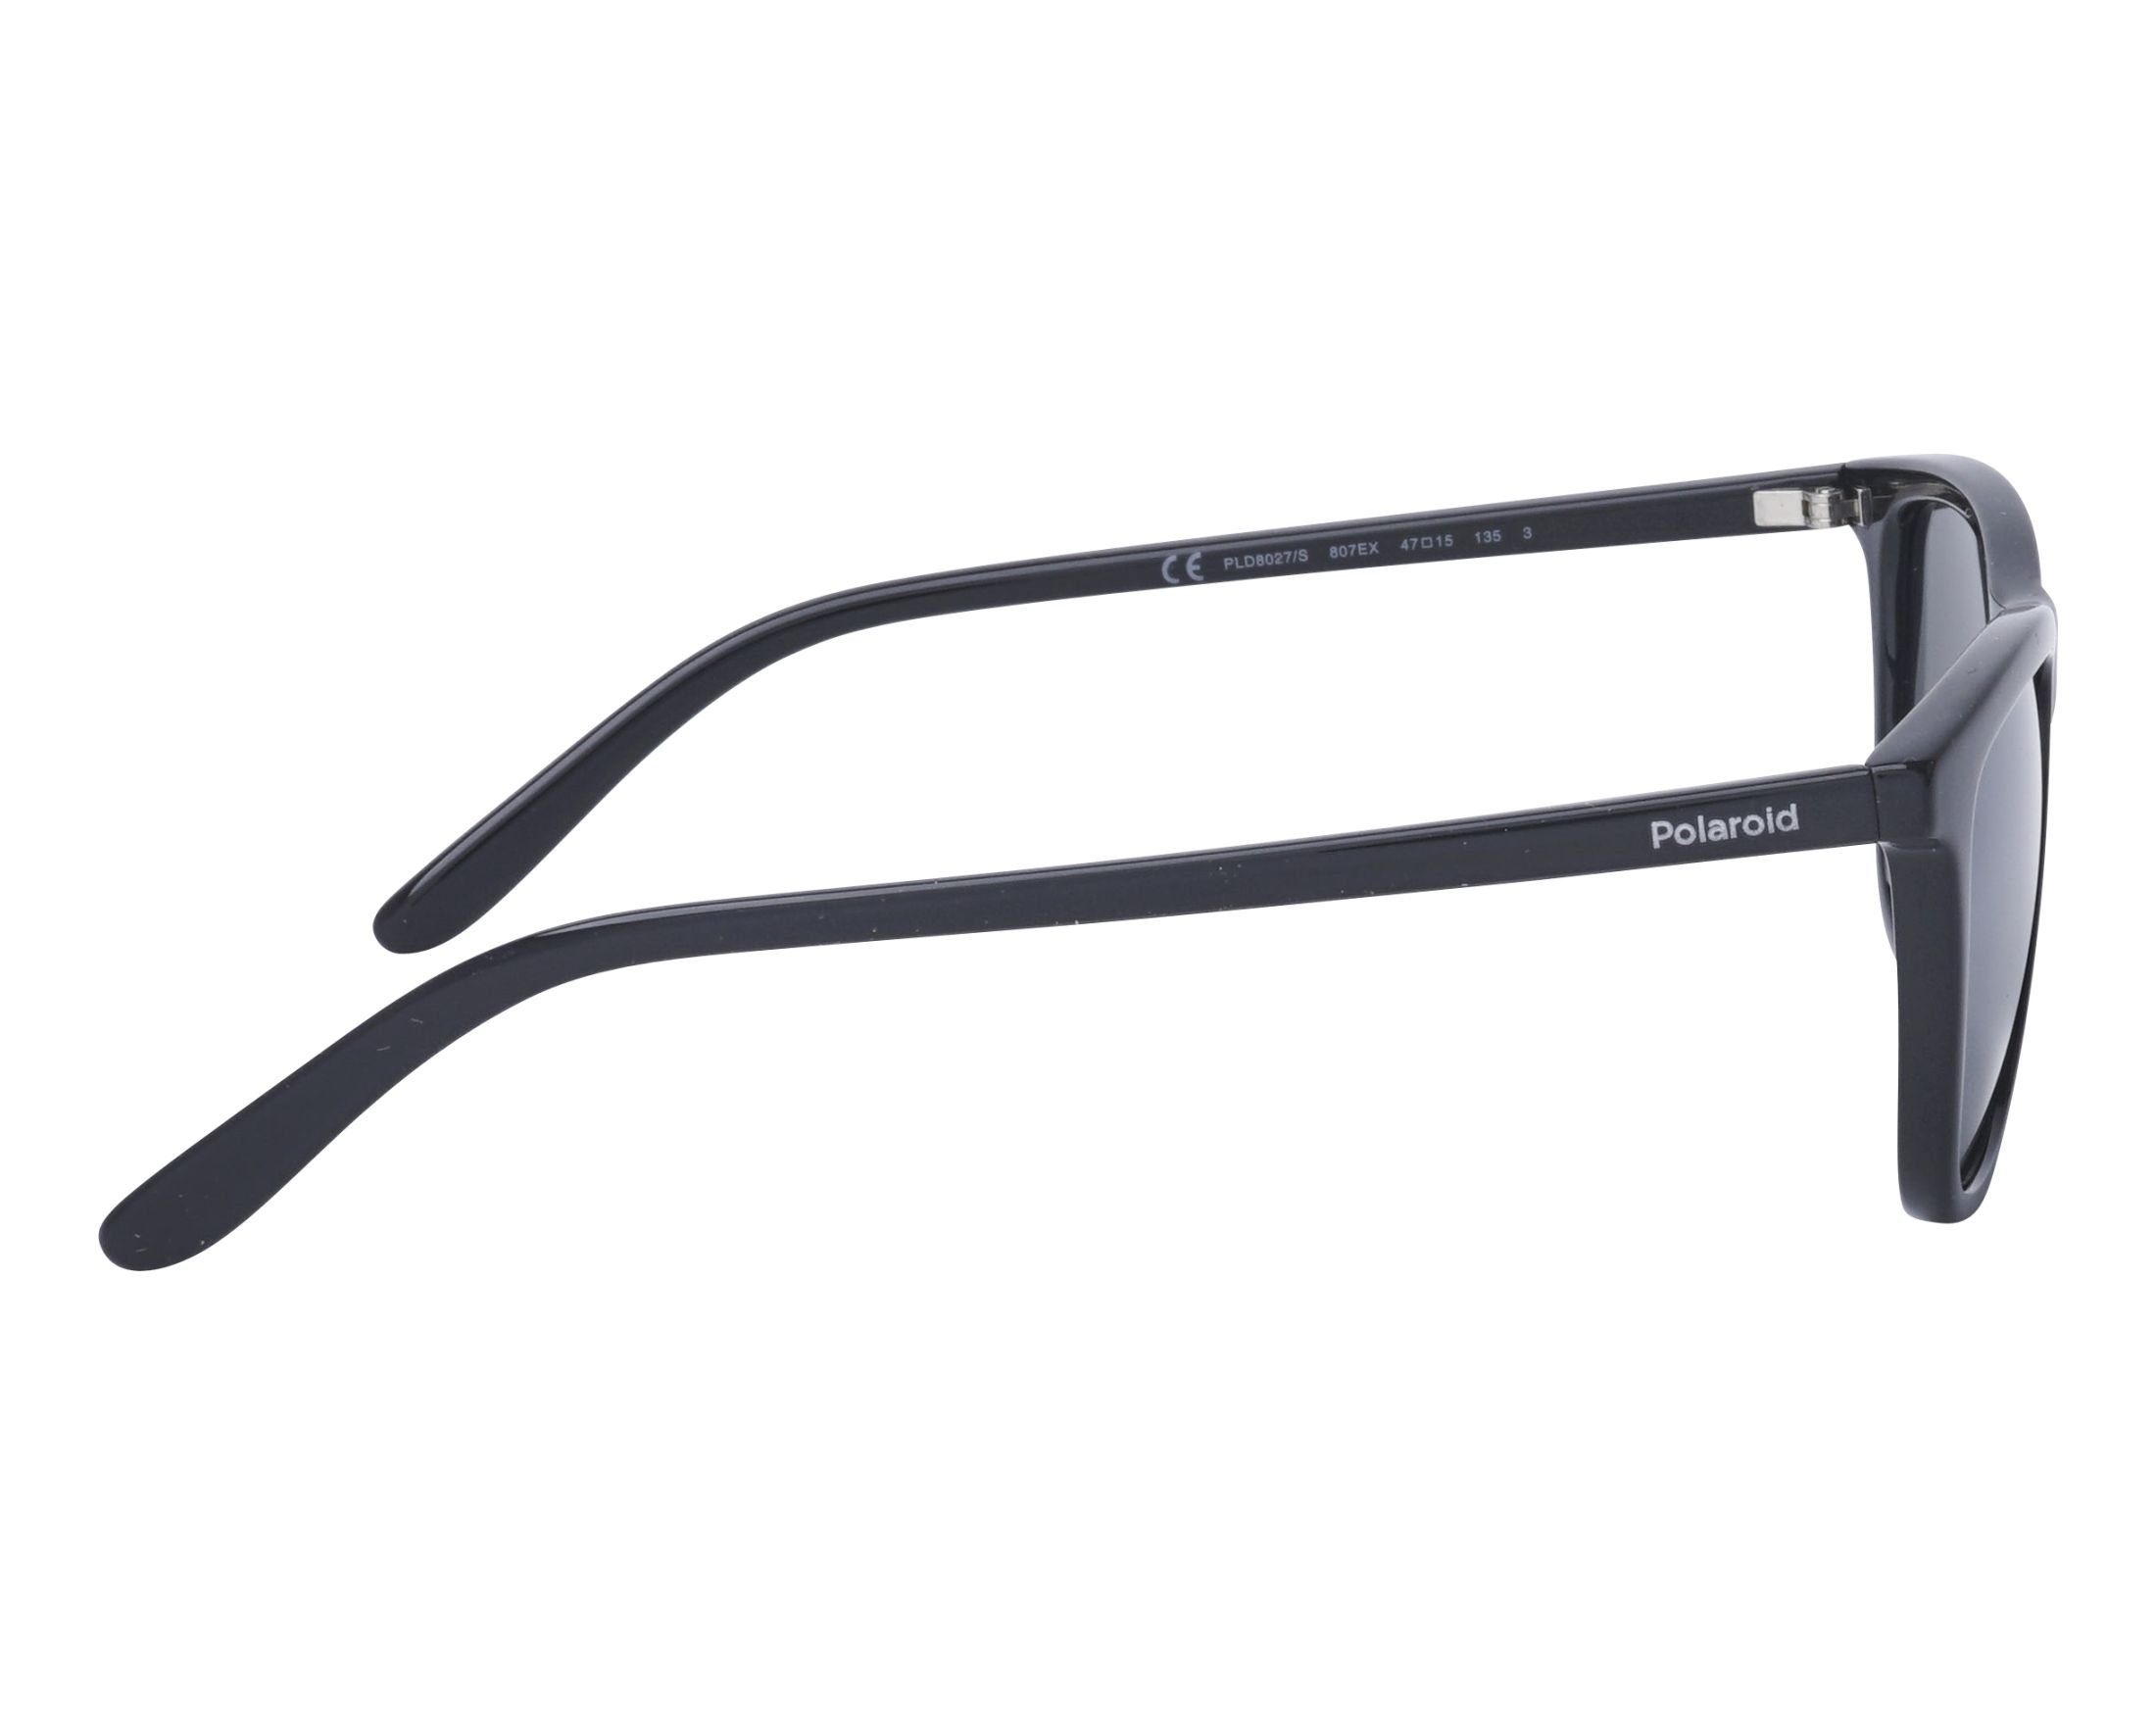 6a7a594b67 Sunglasses Polaroid PLD-8027-S 807EX 47-15 Black side view